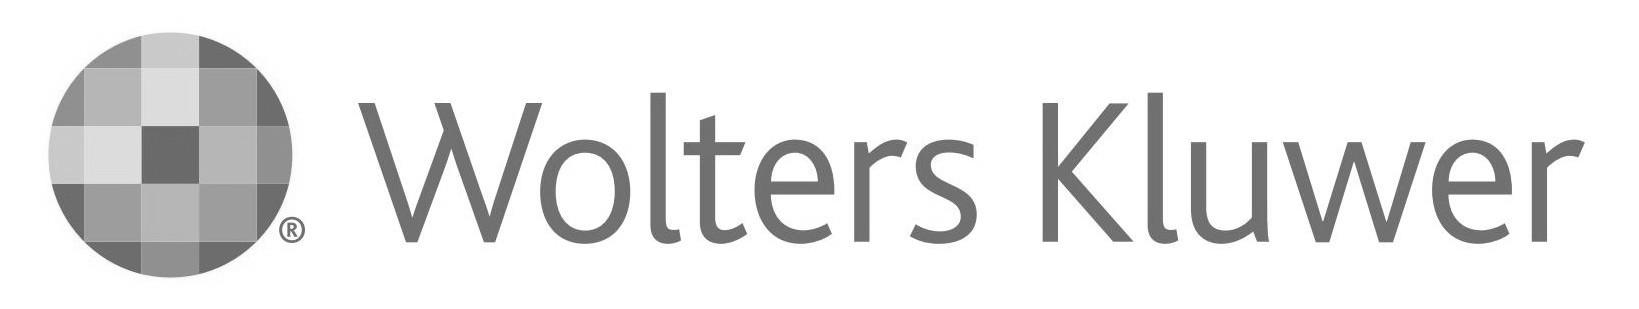 Wolters-Kluwer-logo.jpg